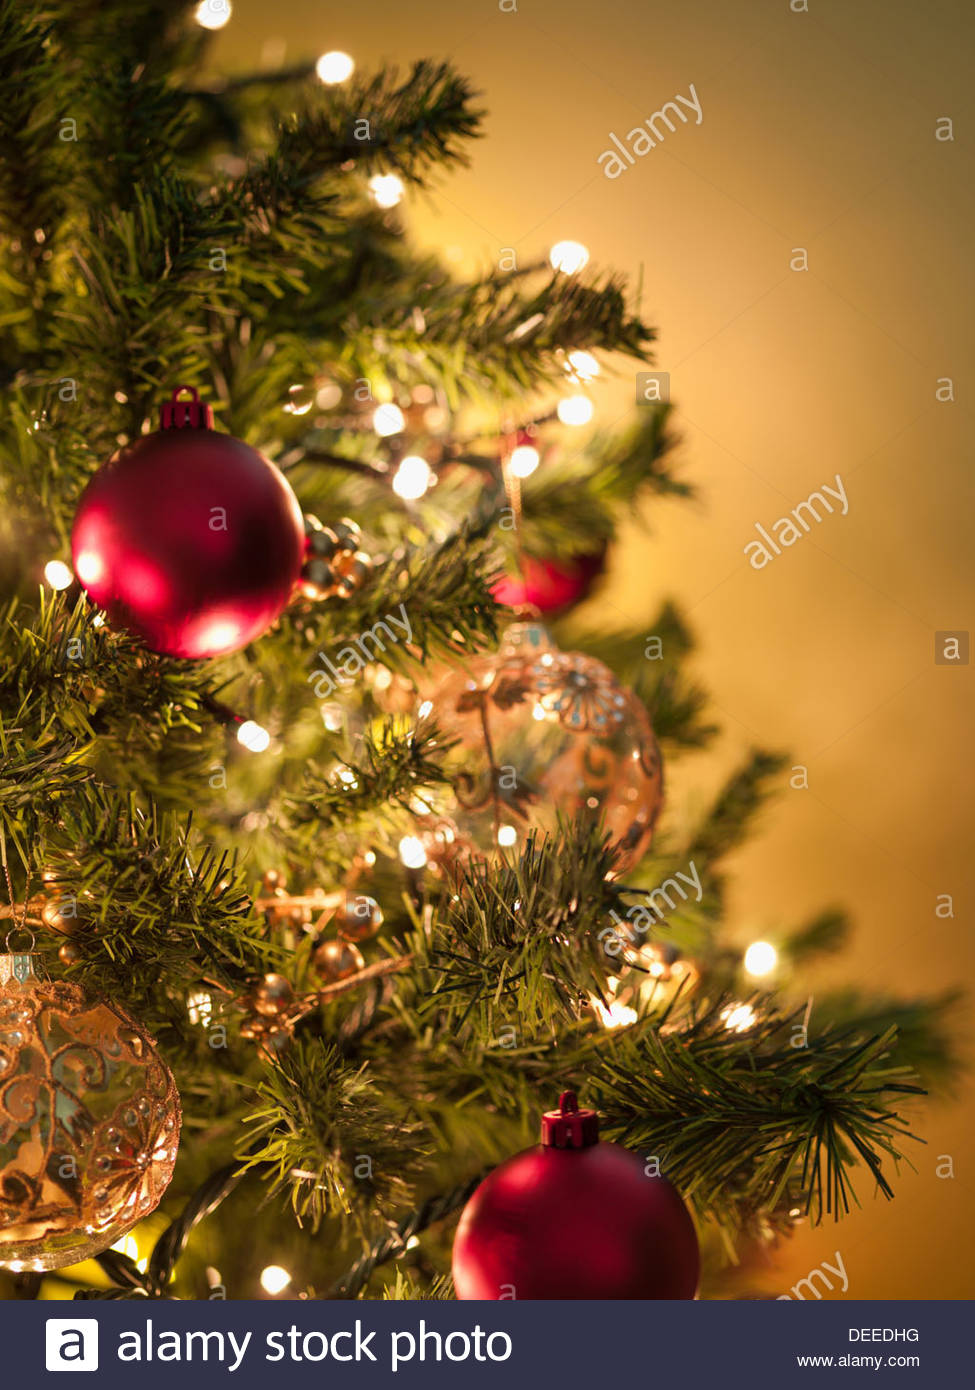 Christmas ornaments on tree - Stock Image